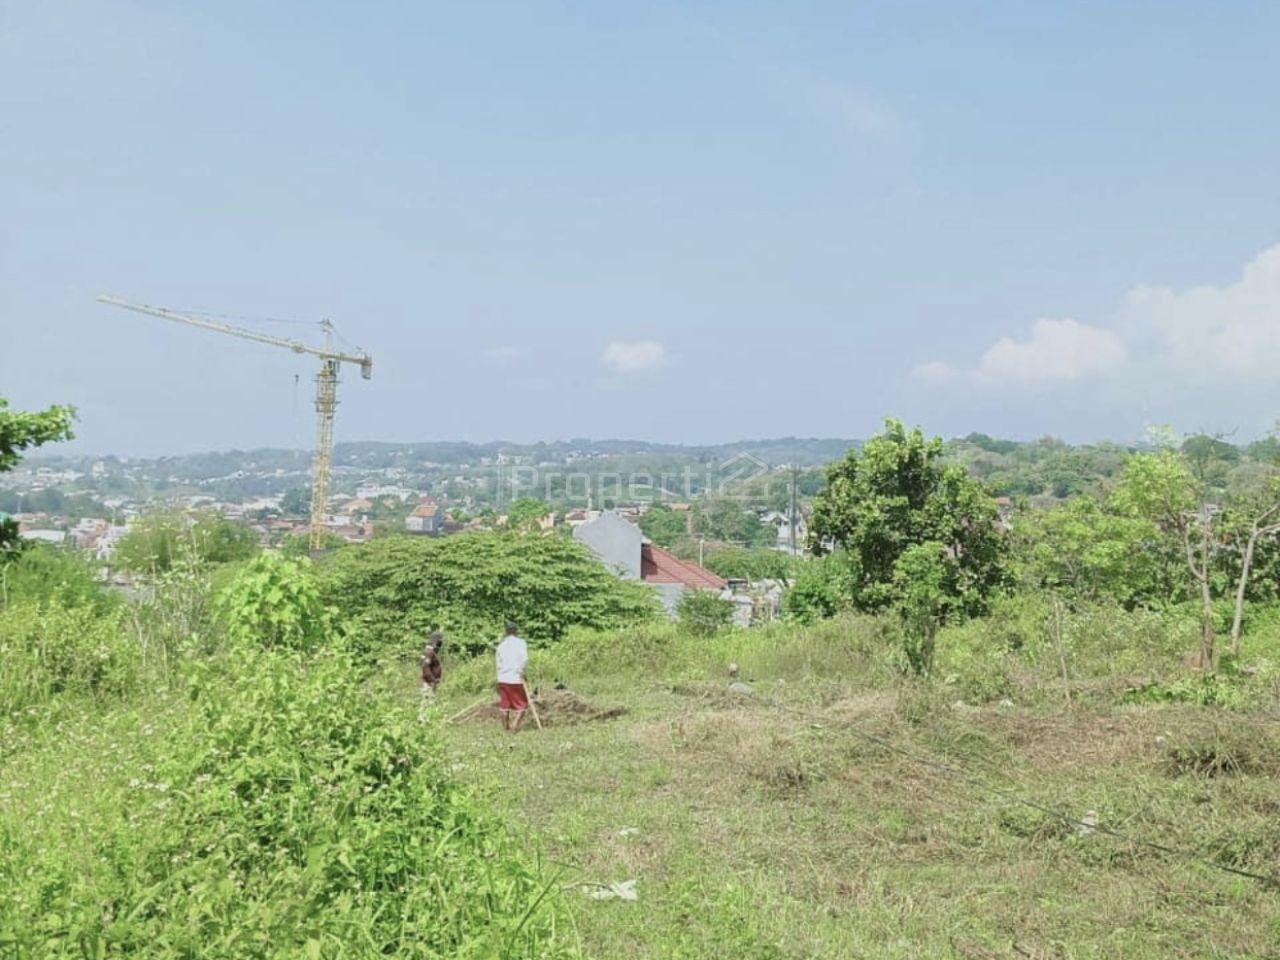 Plot Land at Kedungmundu, Semarang City, Jawa Tengah